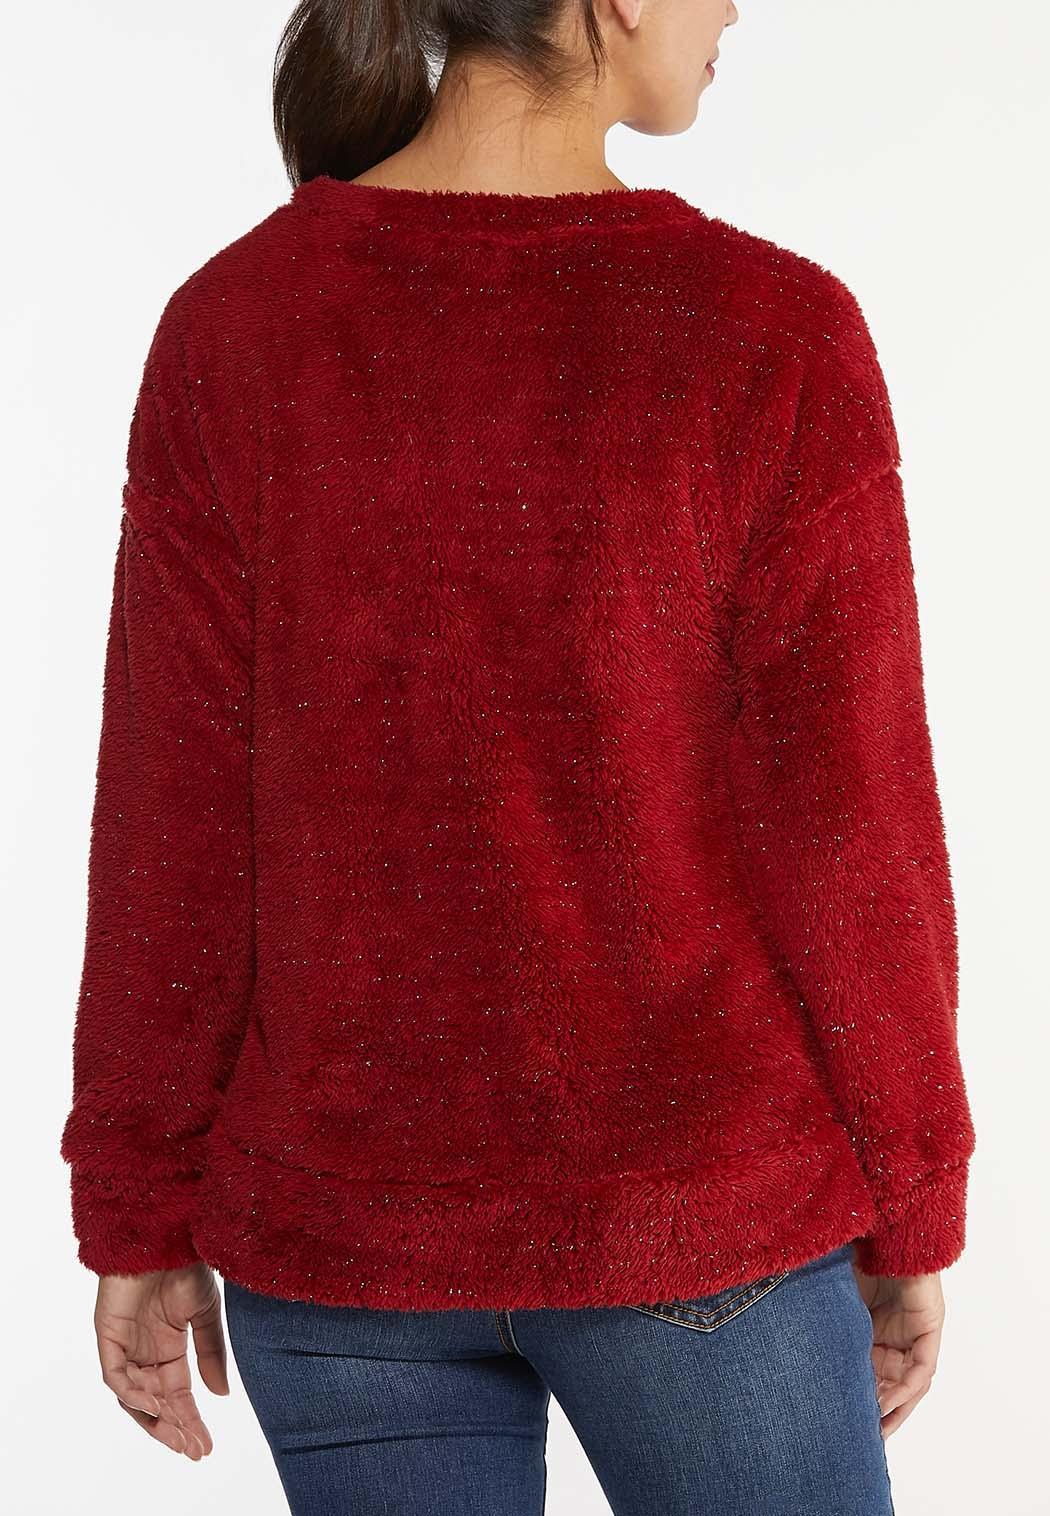 Plus Size Cozy Lurex Top (Item #44437615)